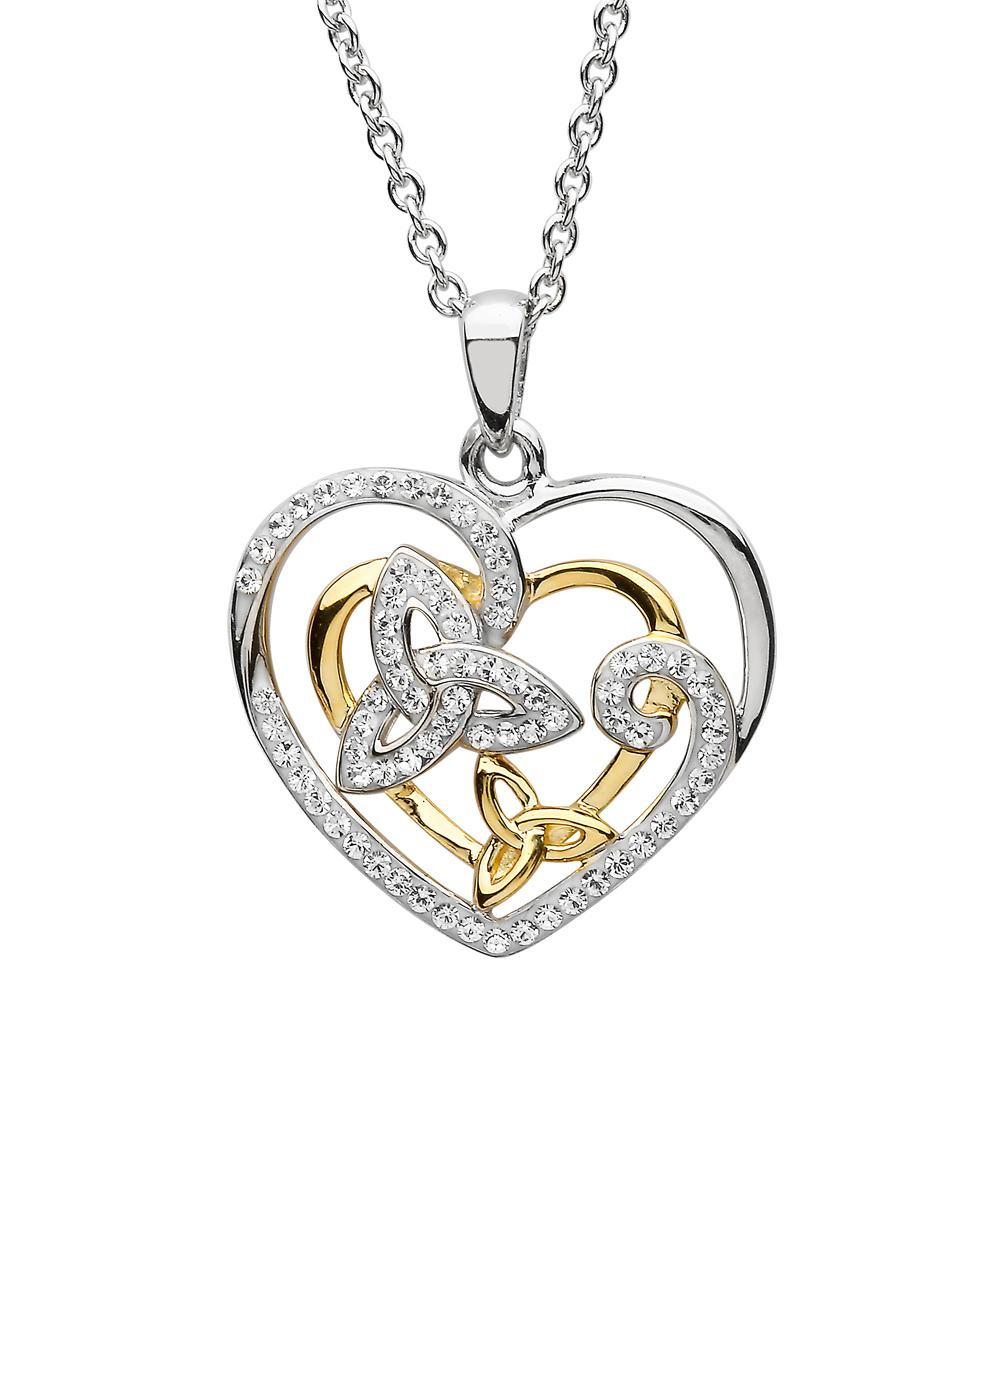 Sterling Silver Trinity Heart Pendant With Swarovski